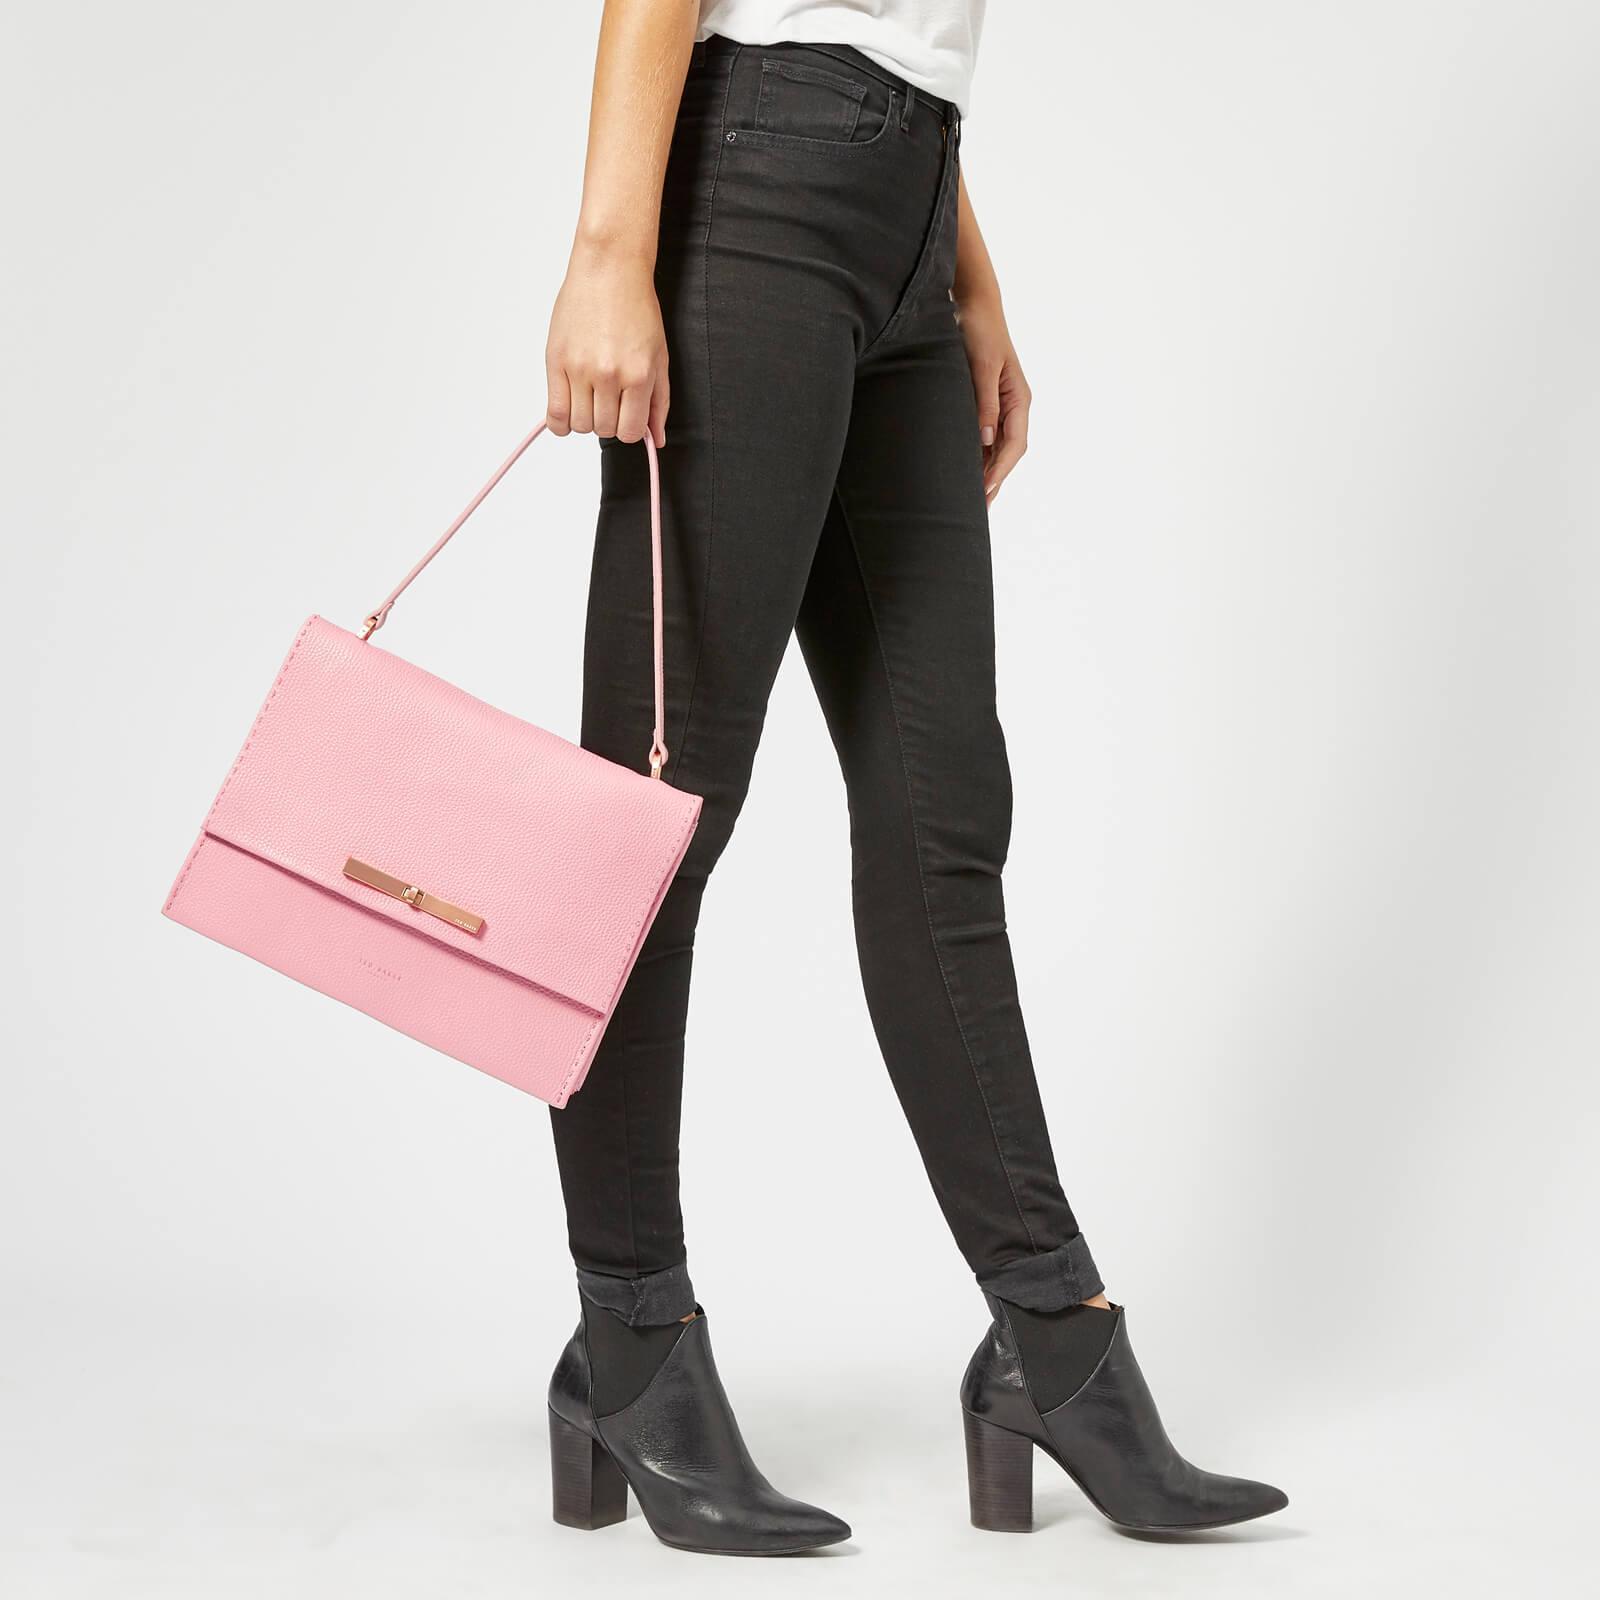 0ca9f2ed4a3c Ted Baker - Pink Jessi Concertina Leather Shoulder Bag - Lyst. View  fullscreen